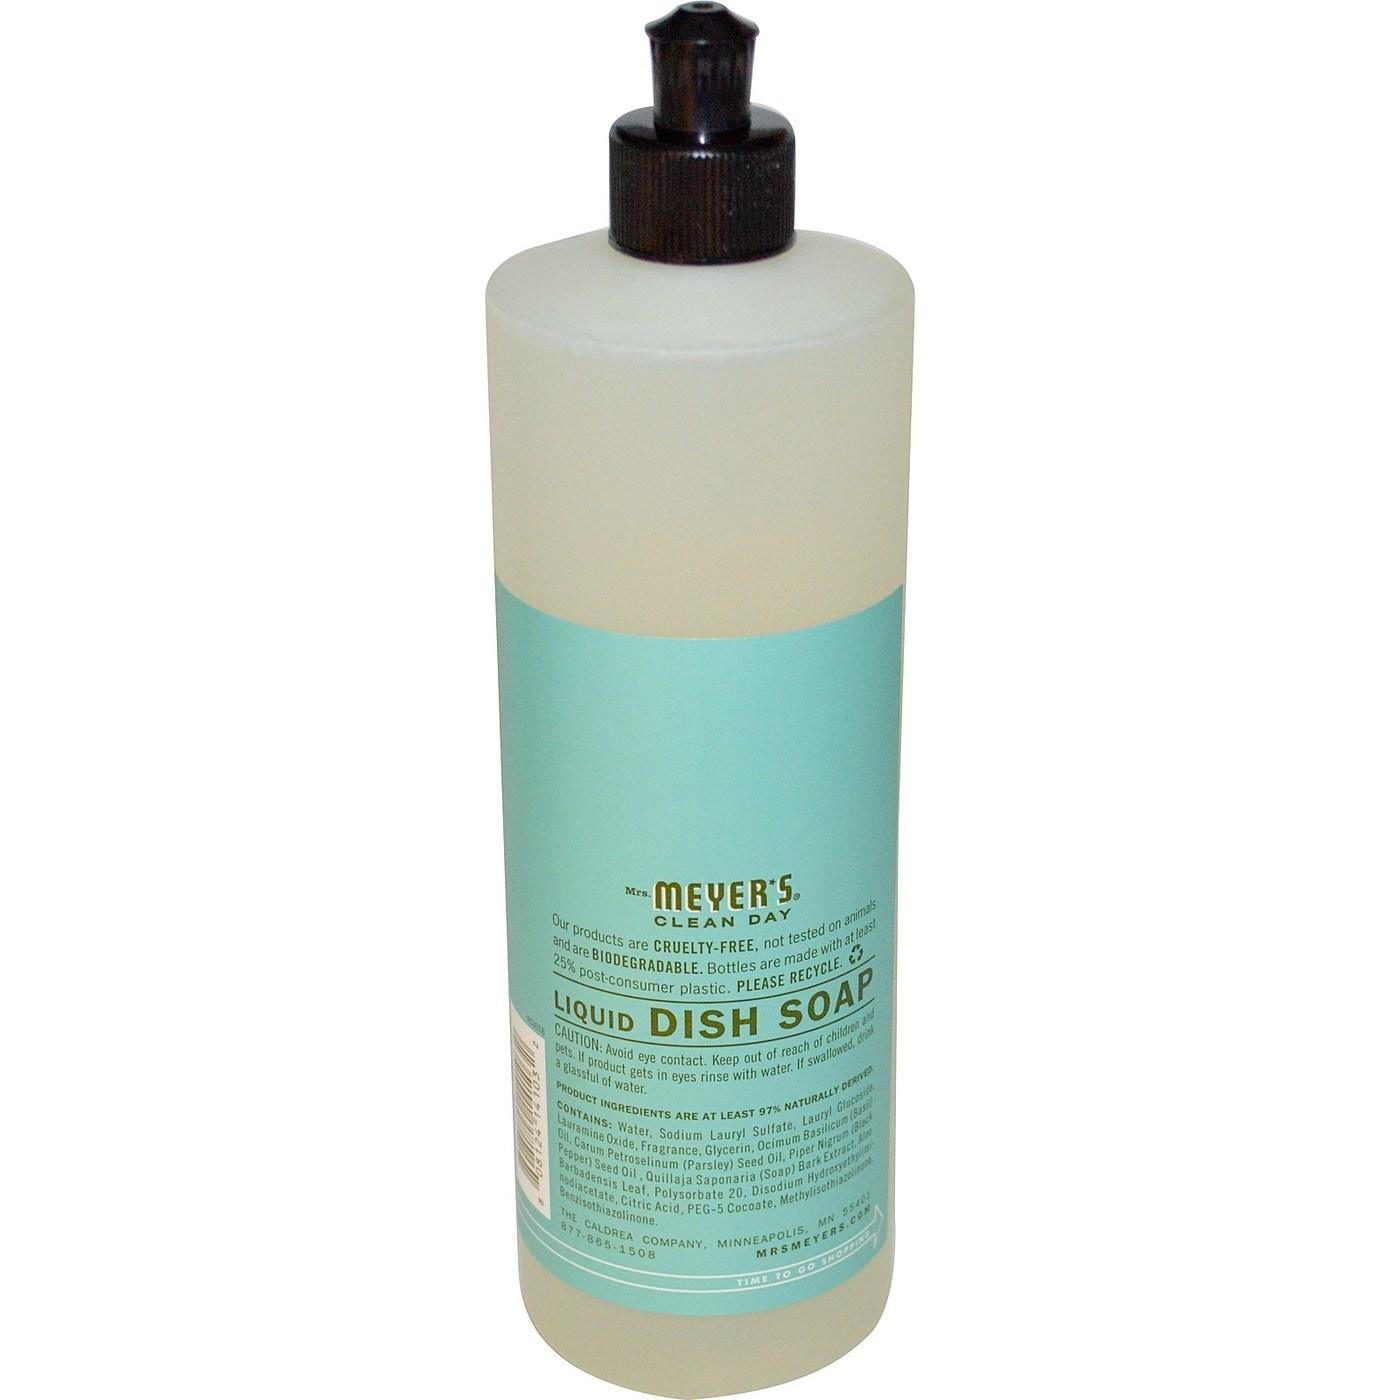 Travel Size Baby Dish Soap